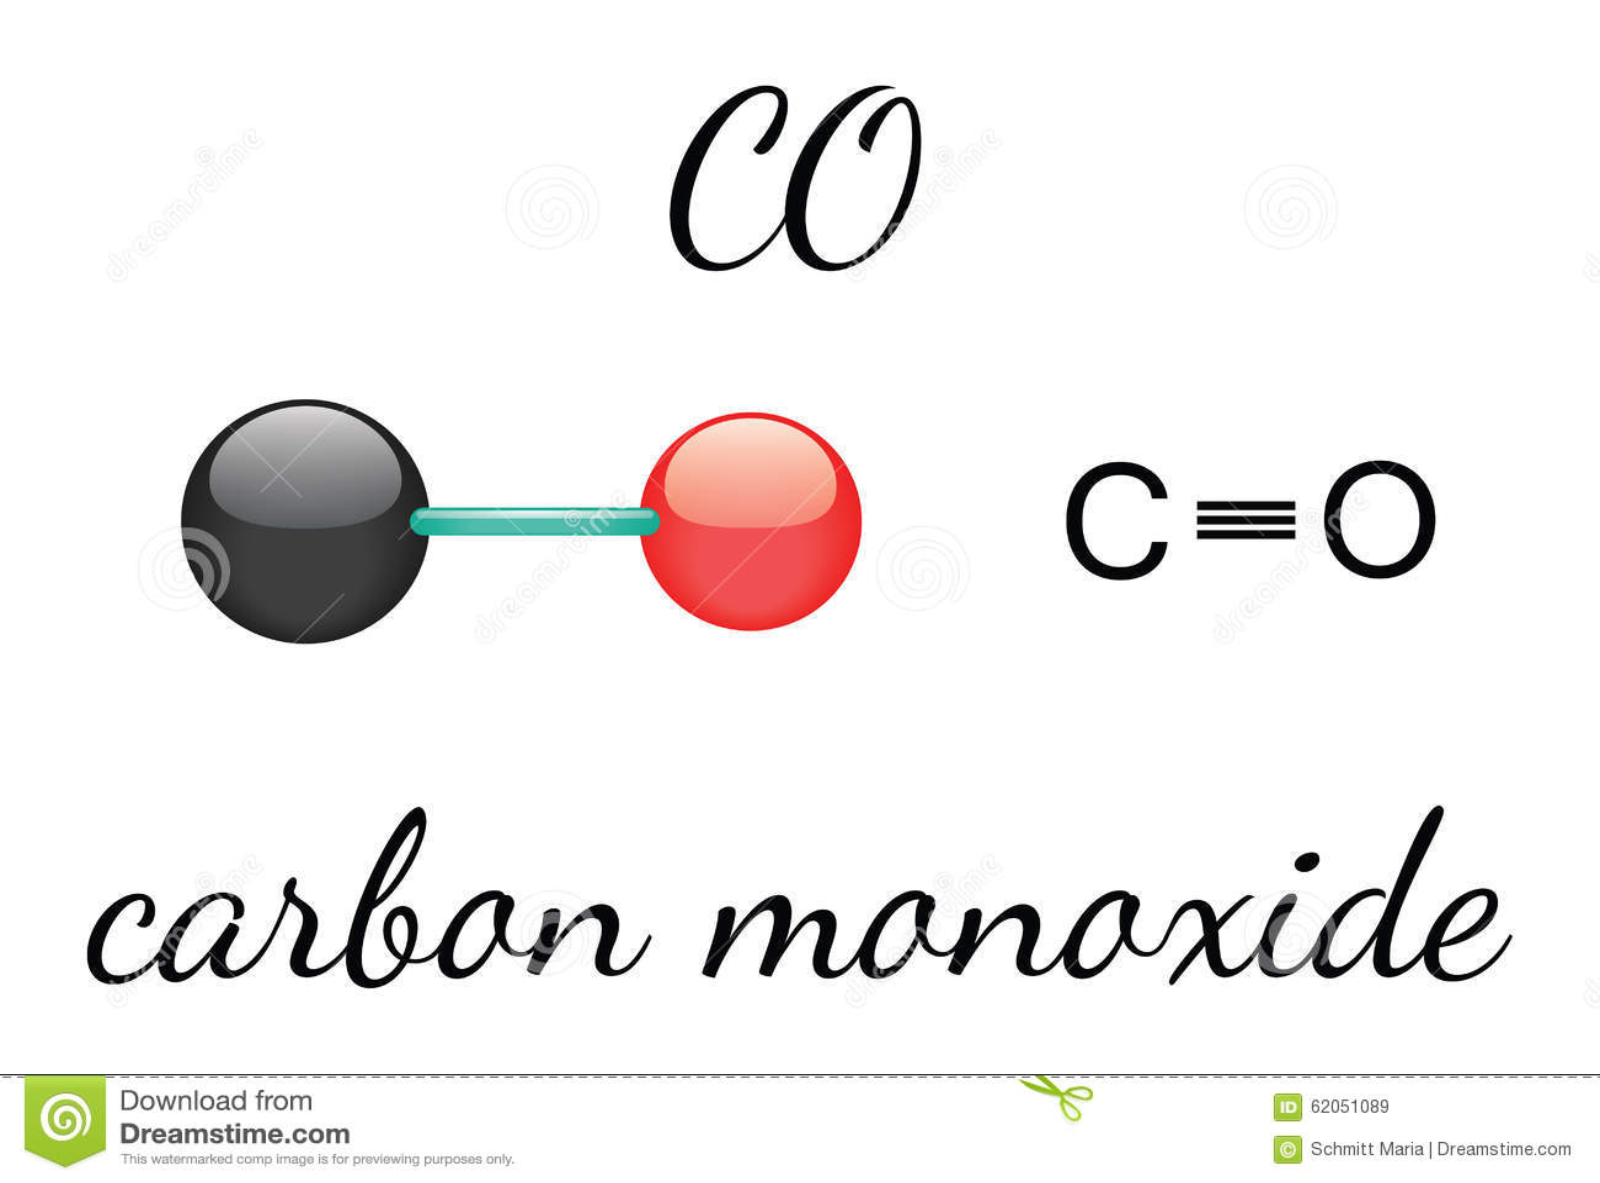 kidde smoke and carbon monoxide alarm wiring diagram 1989 ezgo marathon detector engine